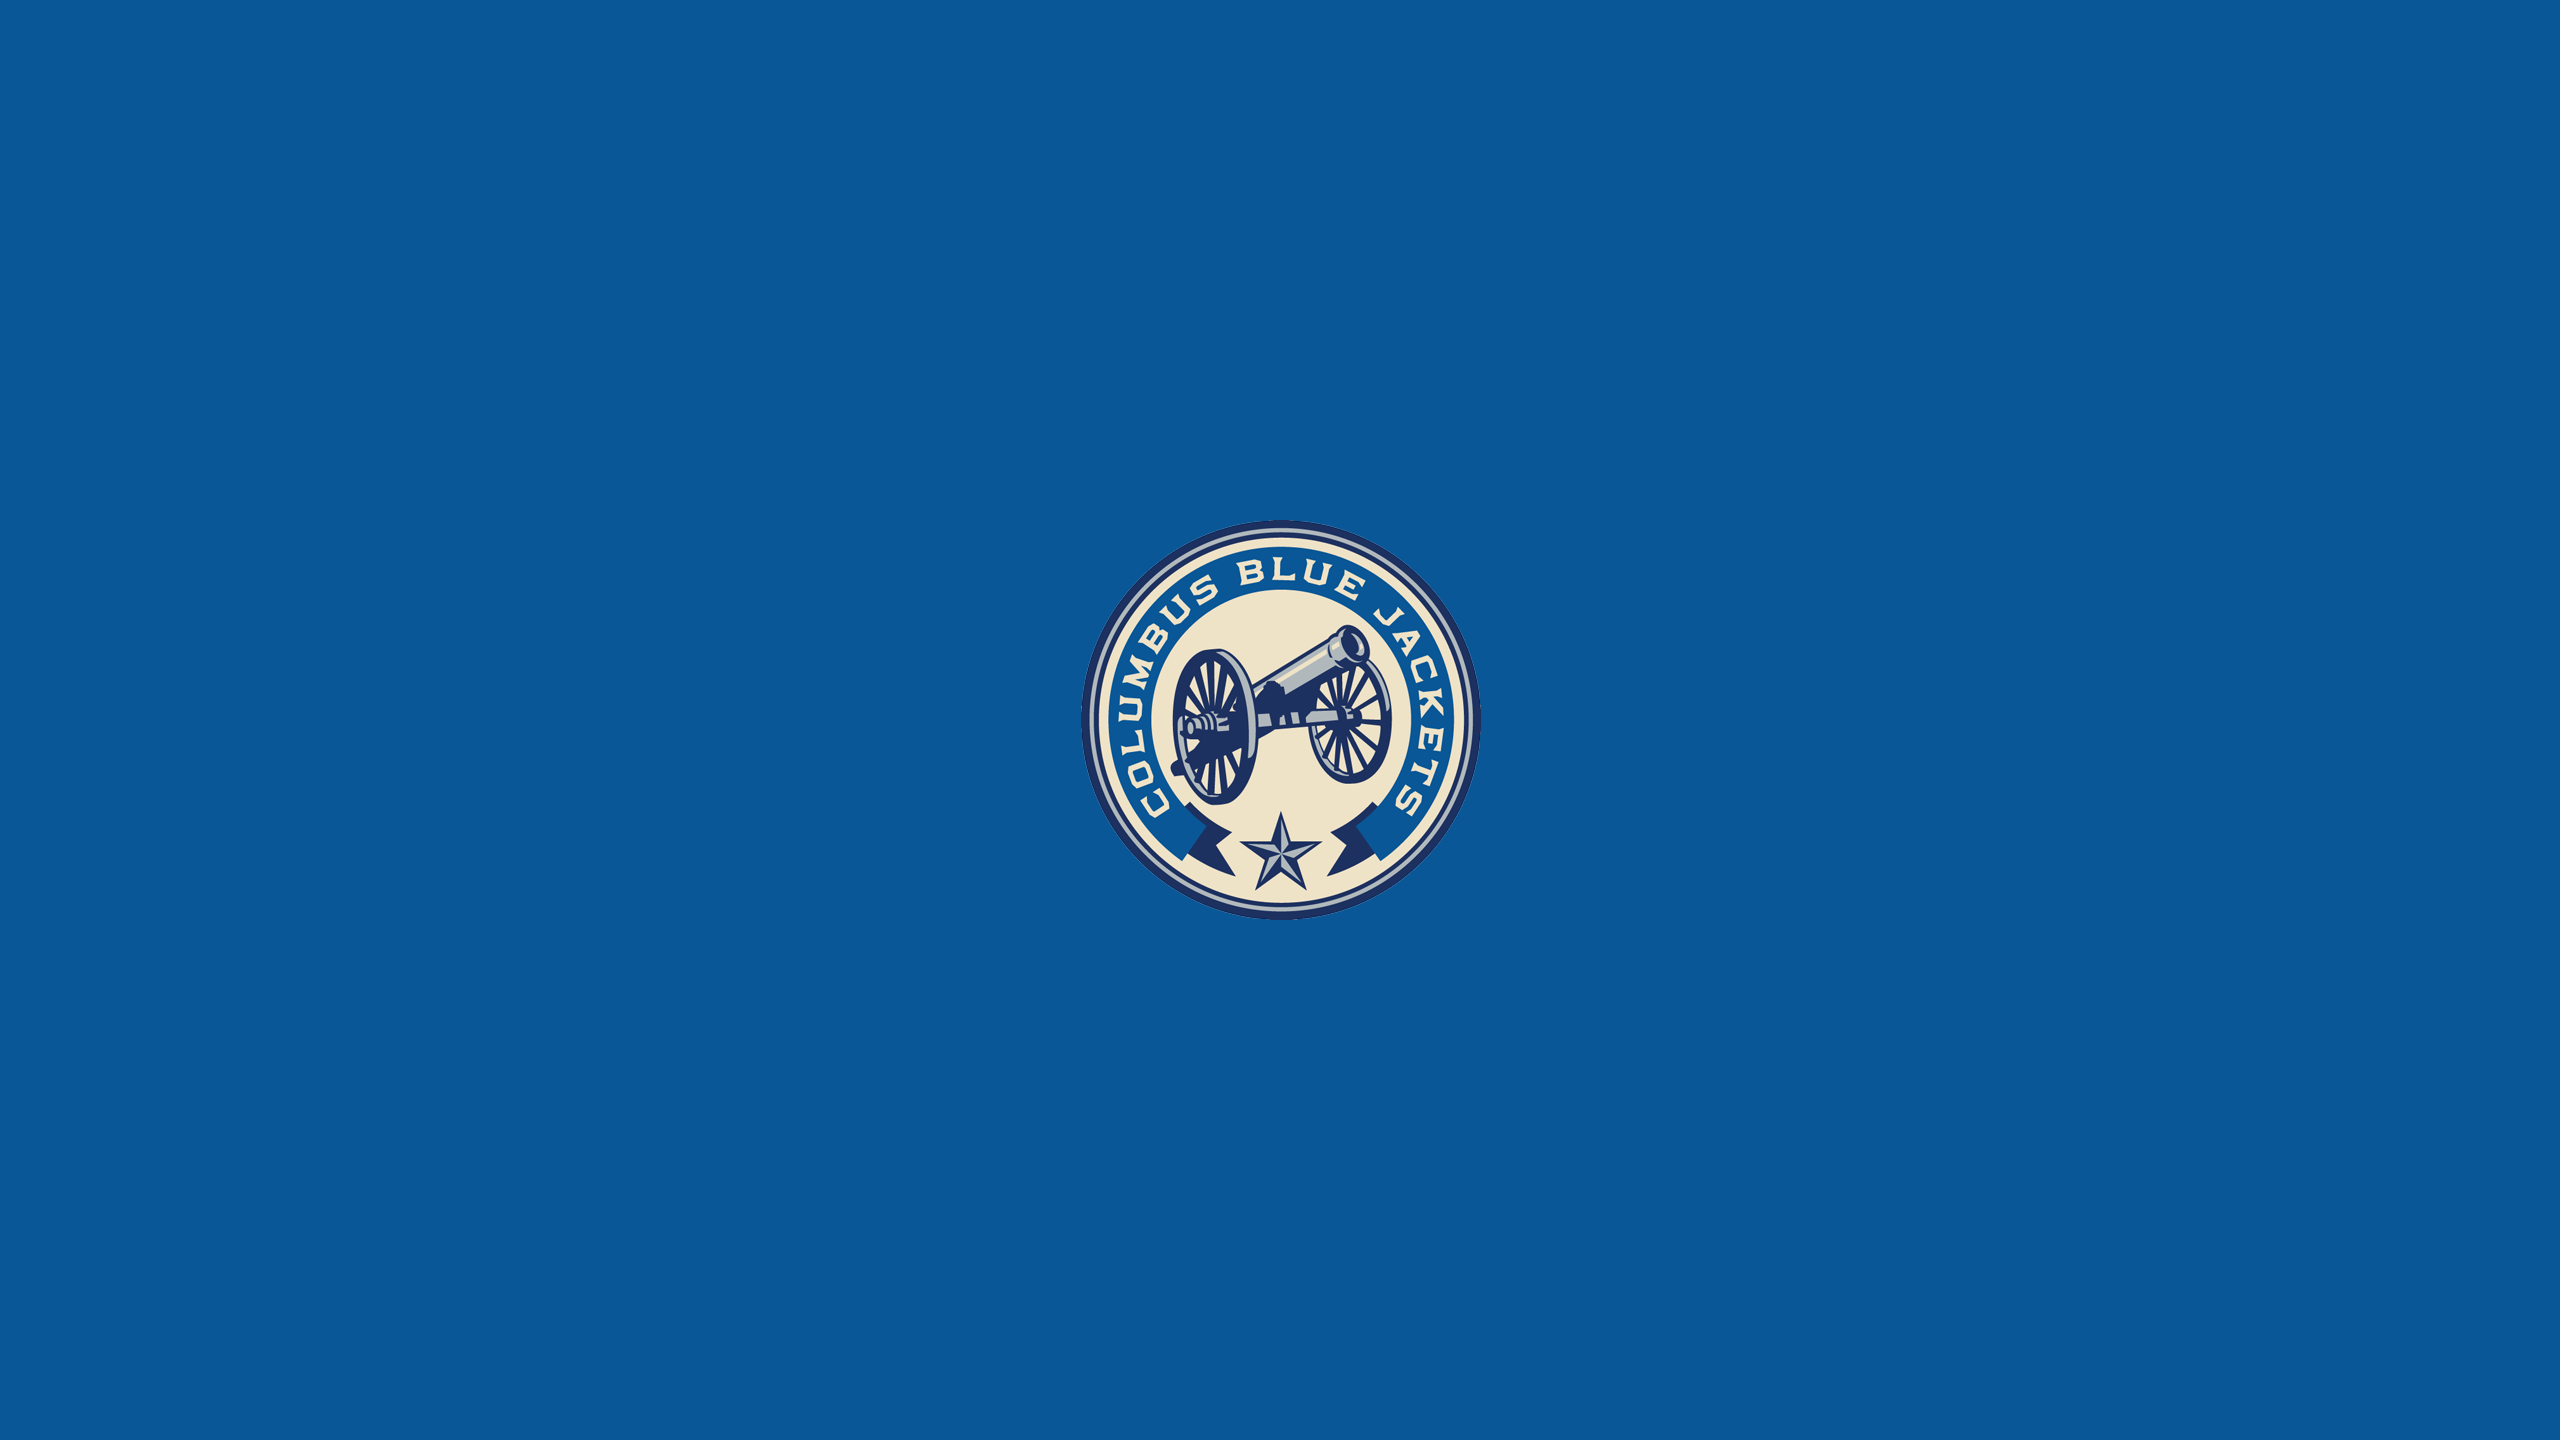 Columbus Blue Jackets Wallpapers - Wallpaper Cave